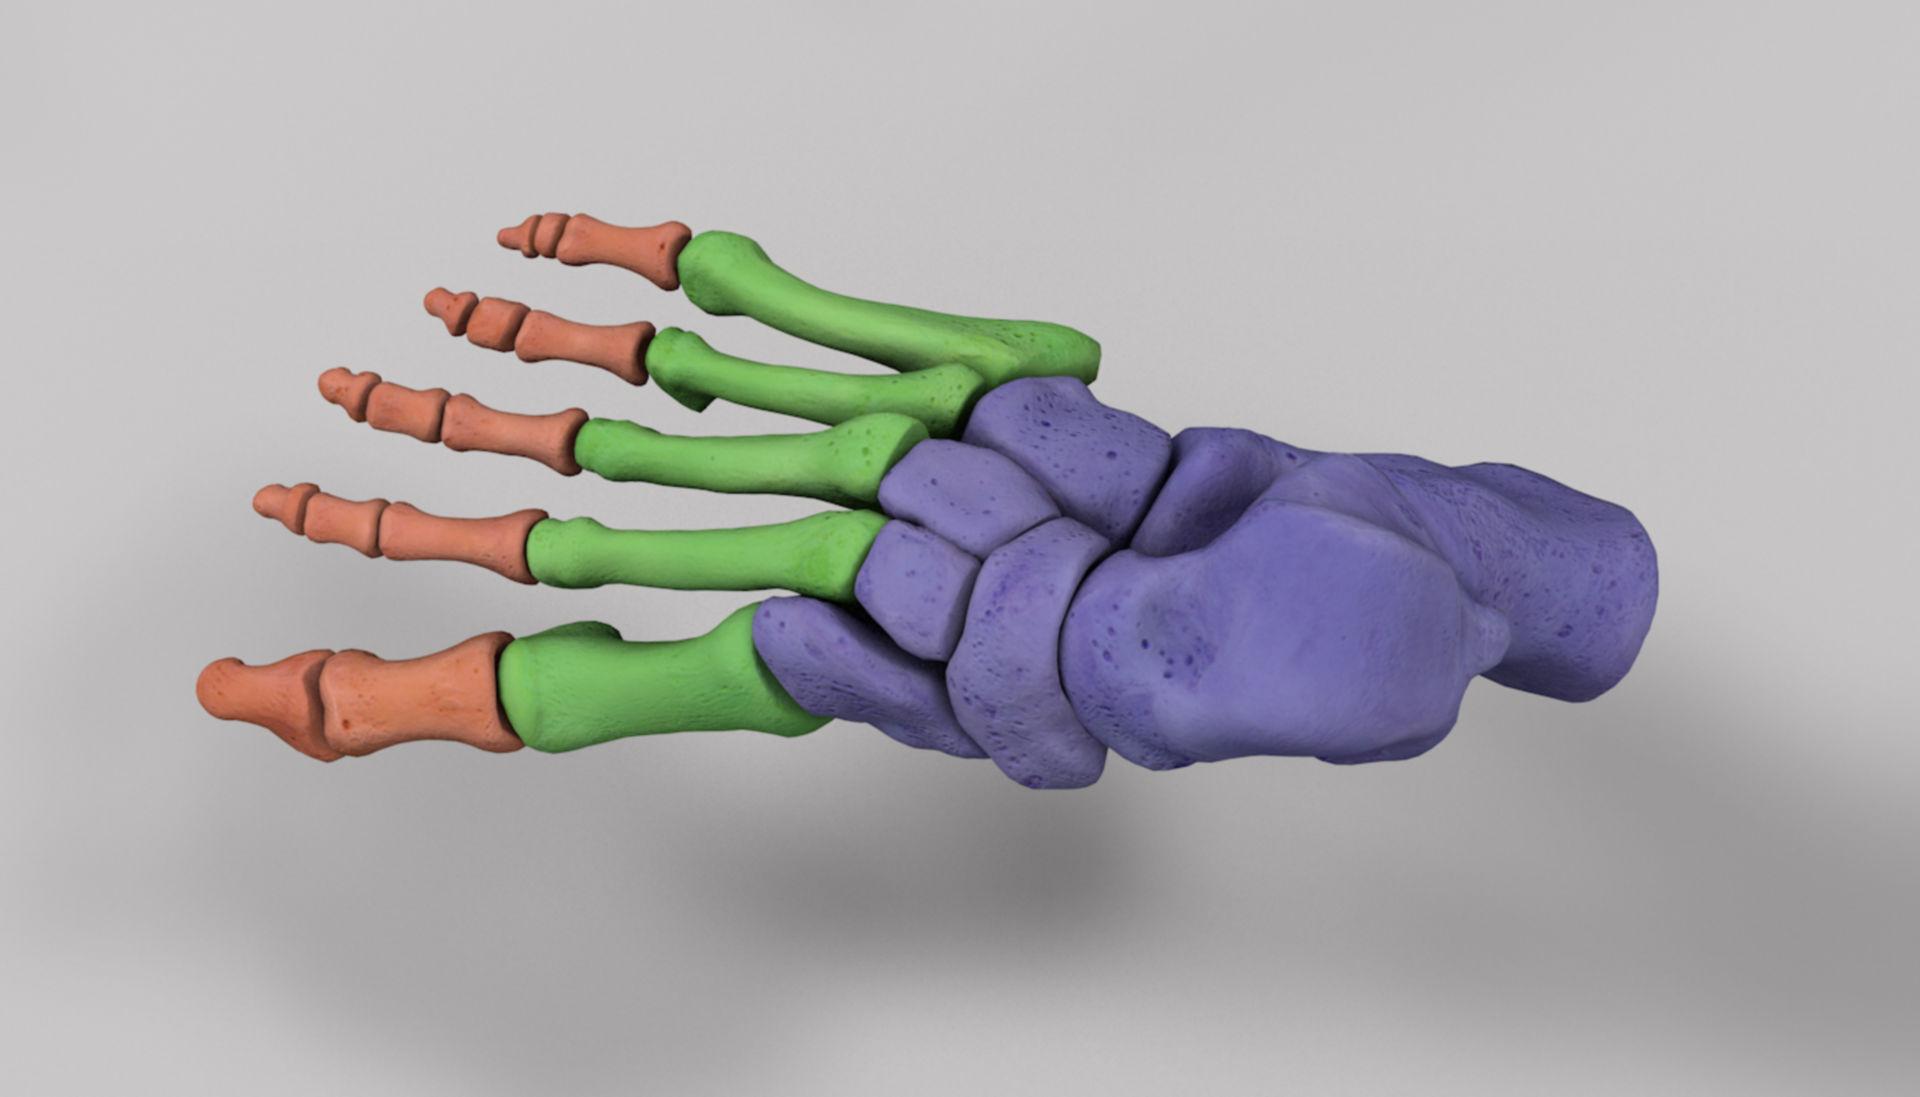 Anatomie des Fußskeletts